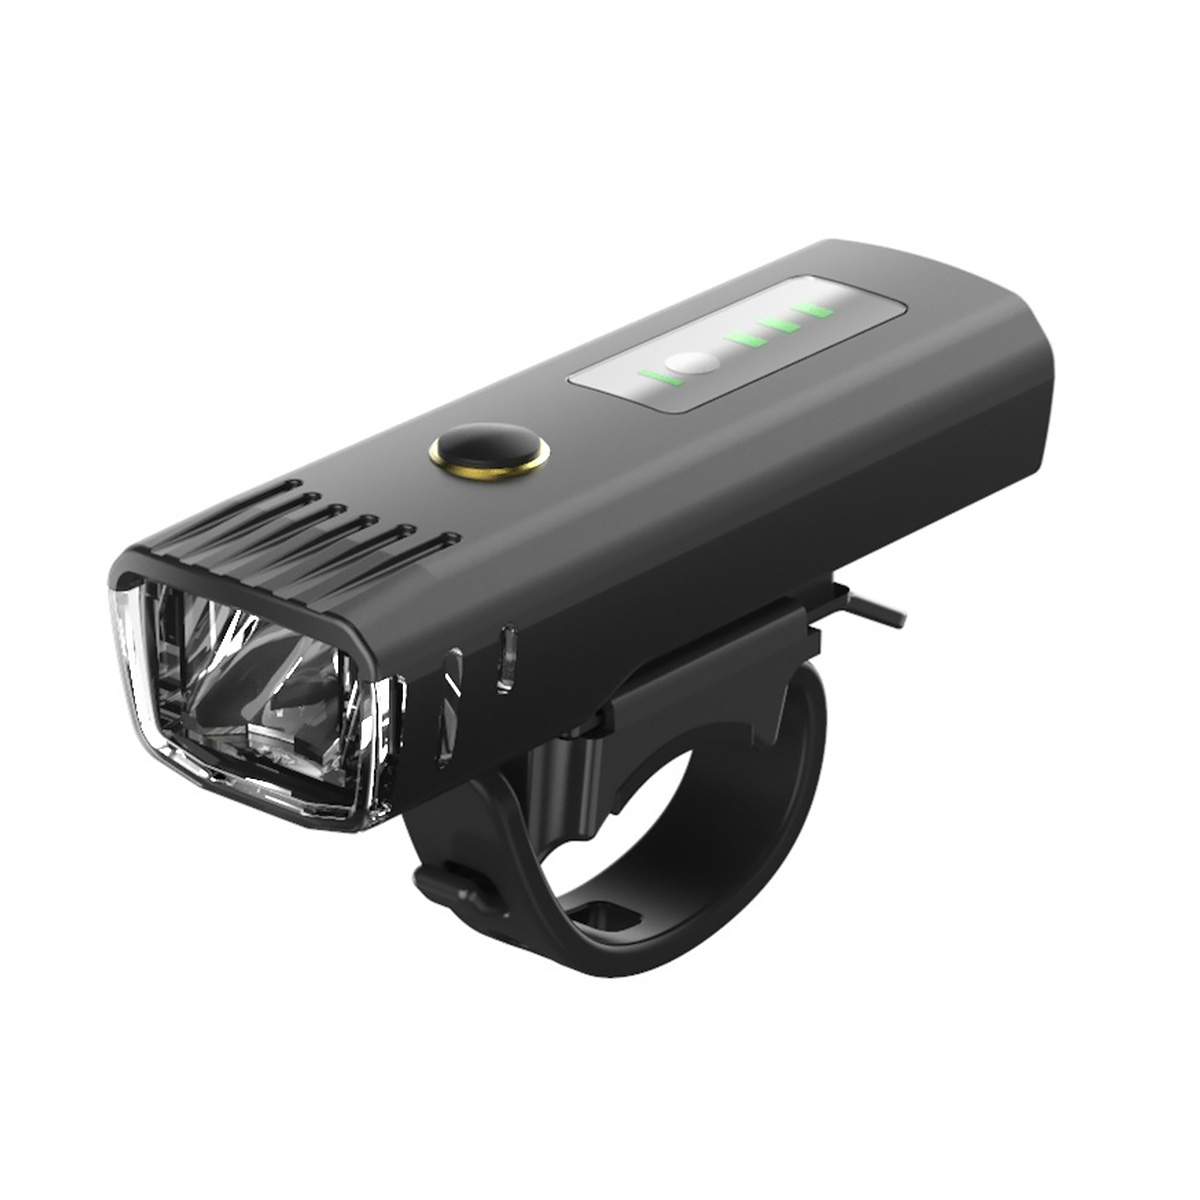 US Waterproof LED Lamp Bike Bicycle Front Head Light Rear Safety Flashlight Set